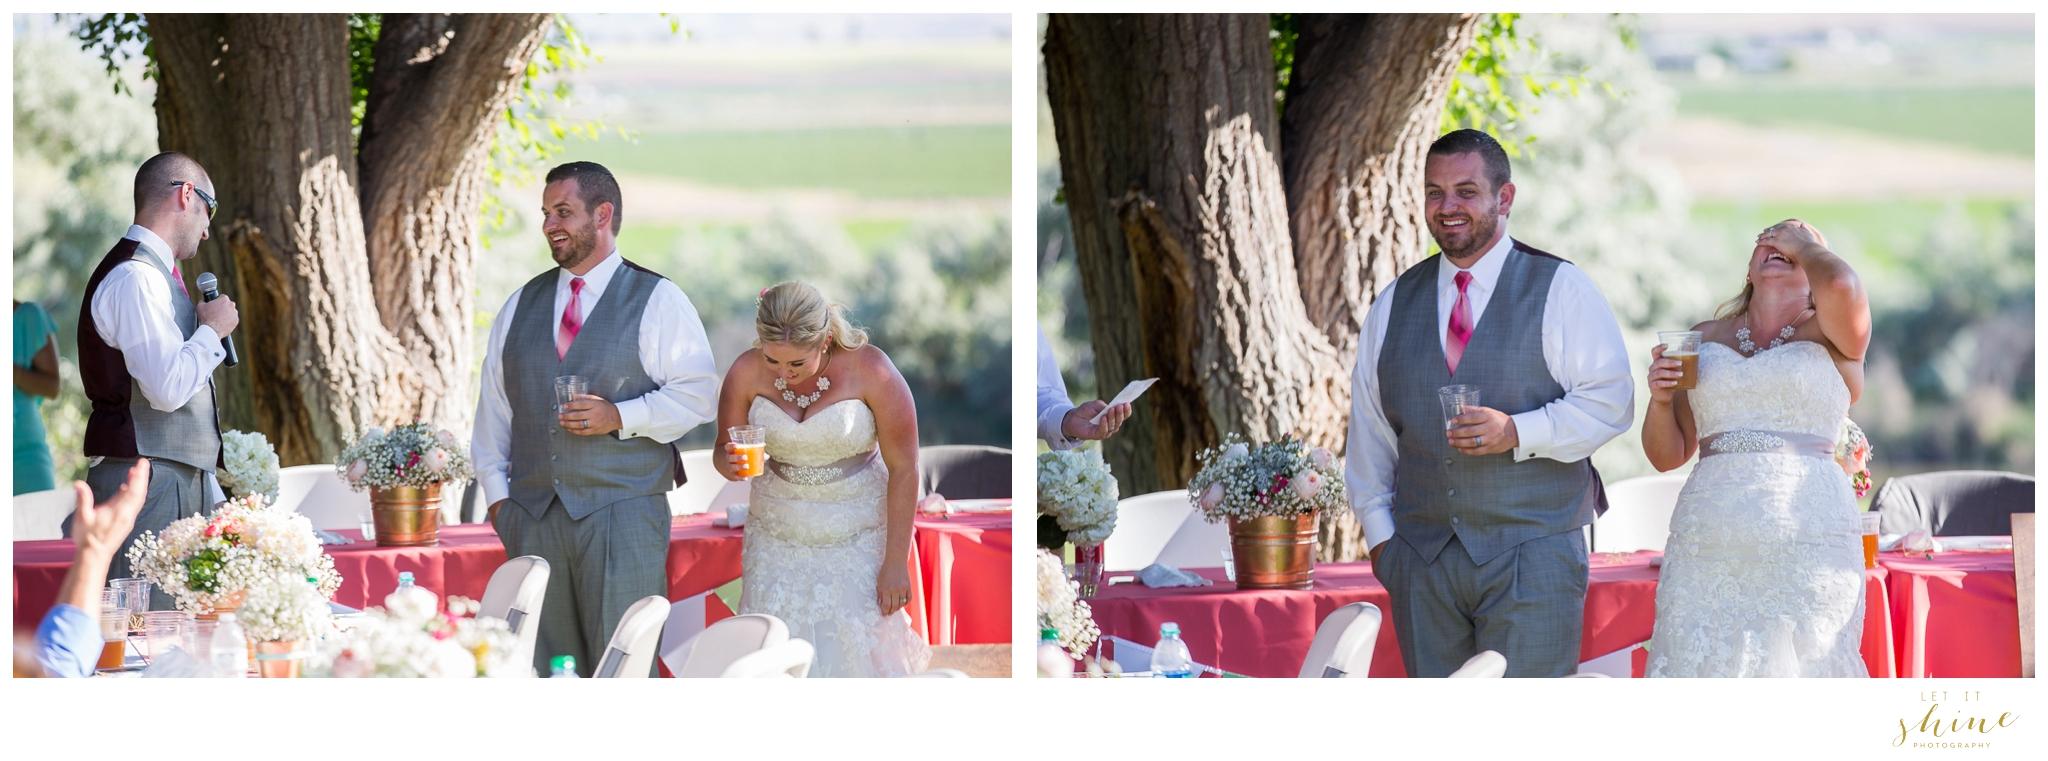 Wild Heart Springs Wedding Idaho Let it Shine Photography-65.jpg